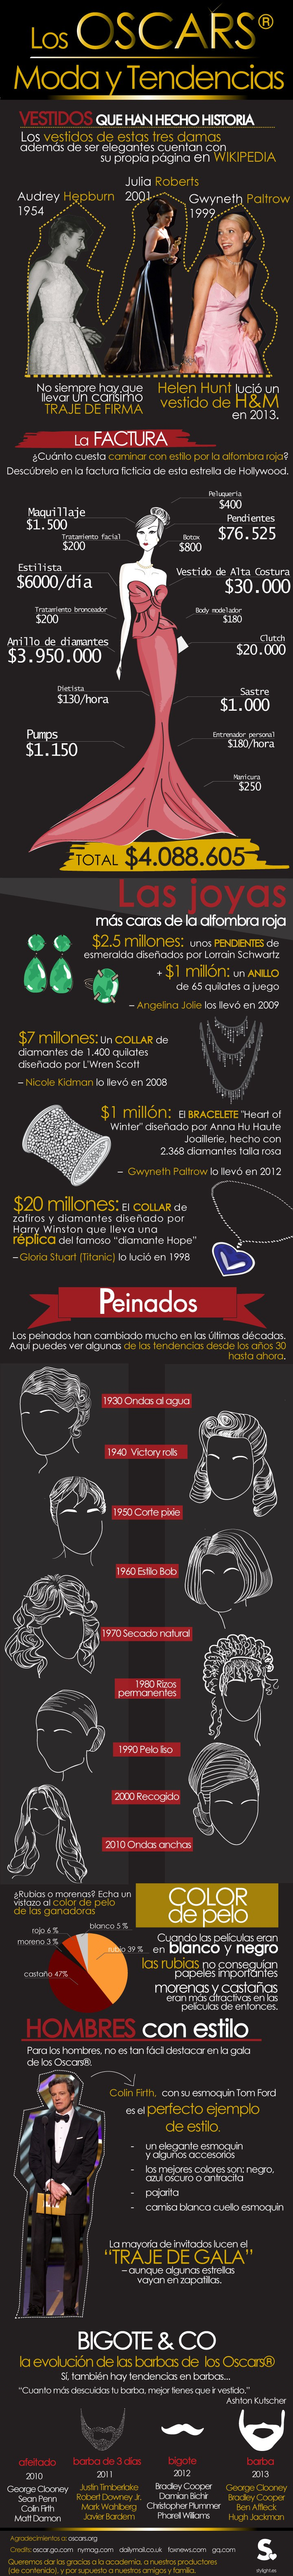 Oscars Moda Y Tendencias Infografia Infographic Learning Spanish Ap Spanish Language Spanish Classroom Activities